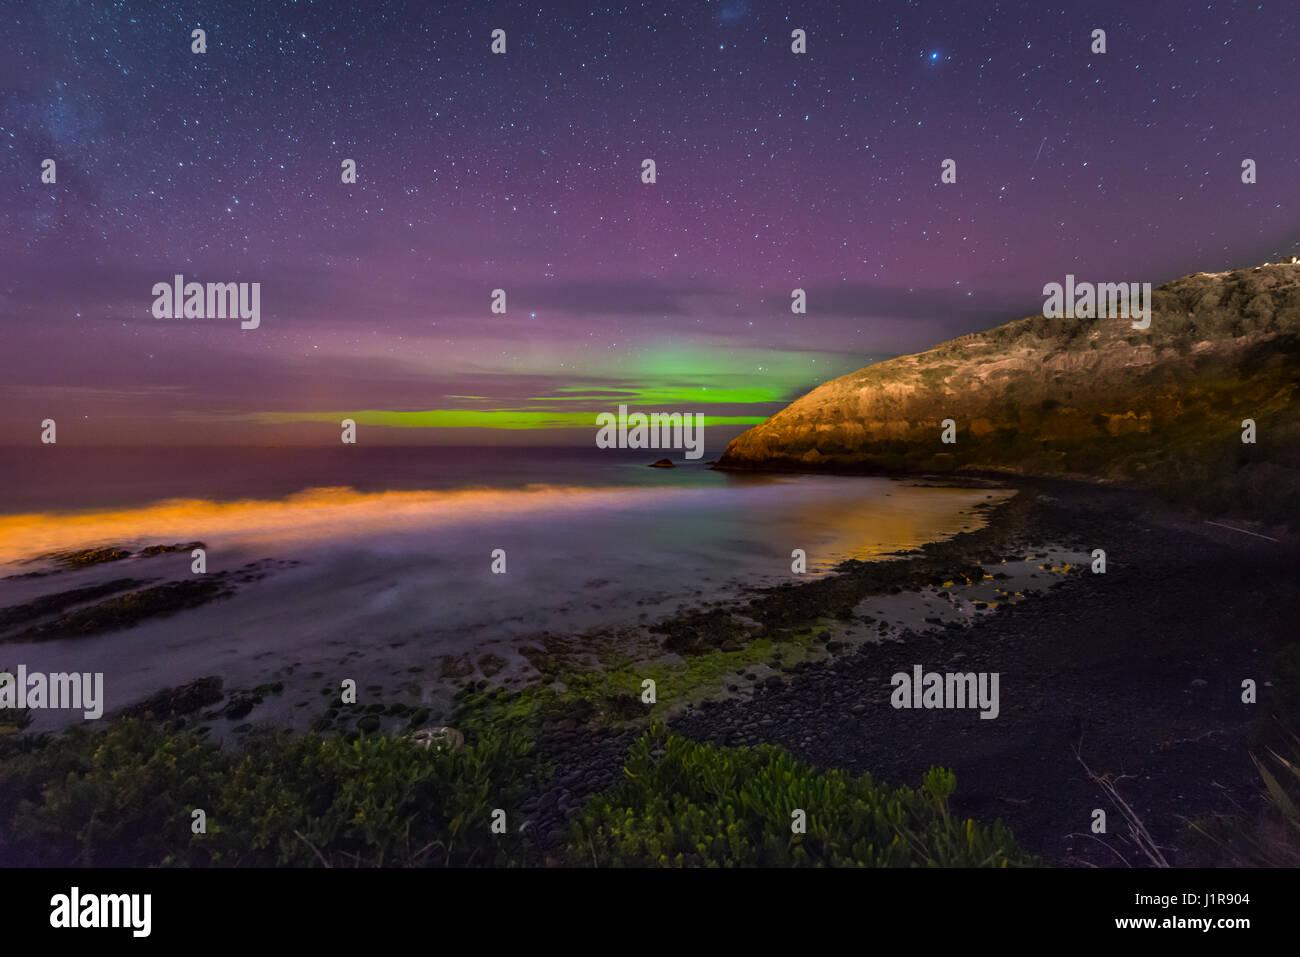 Southern lights, aurora australis over the sea, sand dunes, Second Beach, Dunedin, Otago, Southland, New Zealand - Stock Image